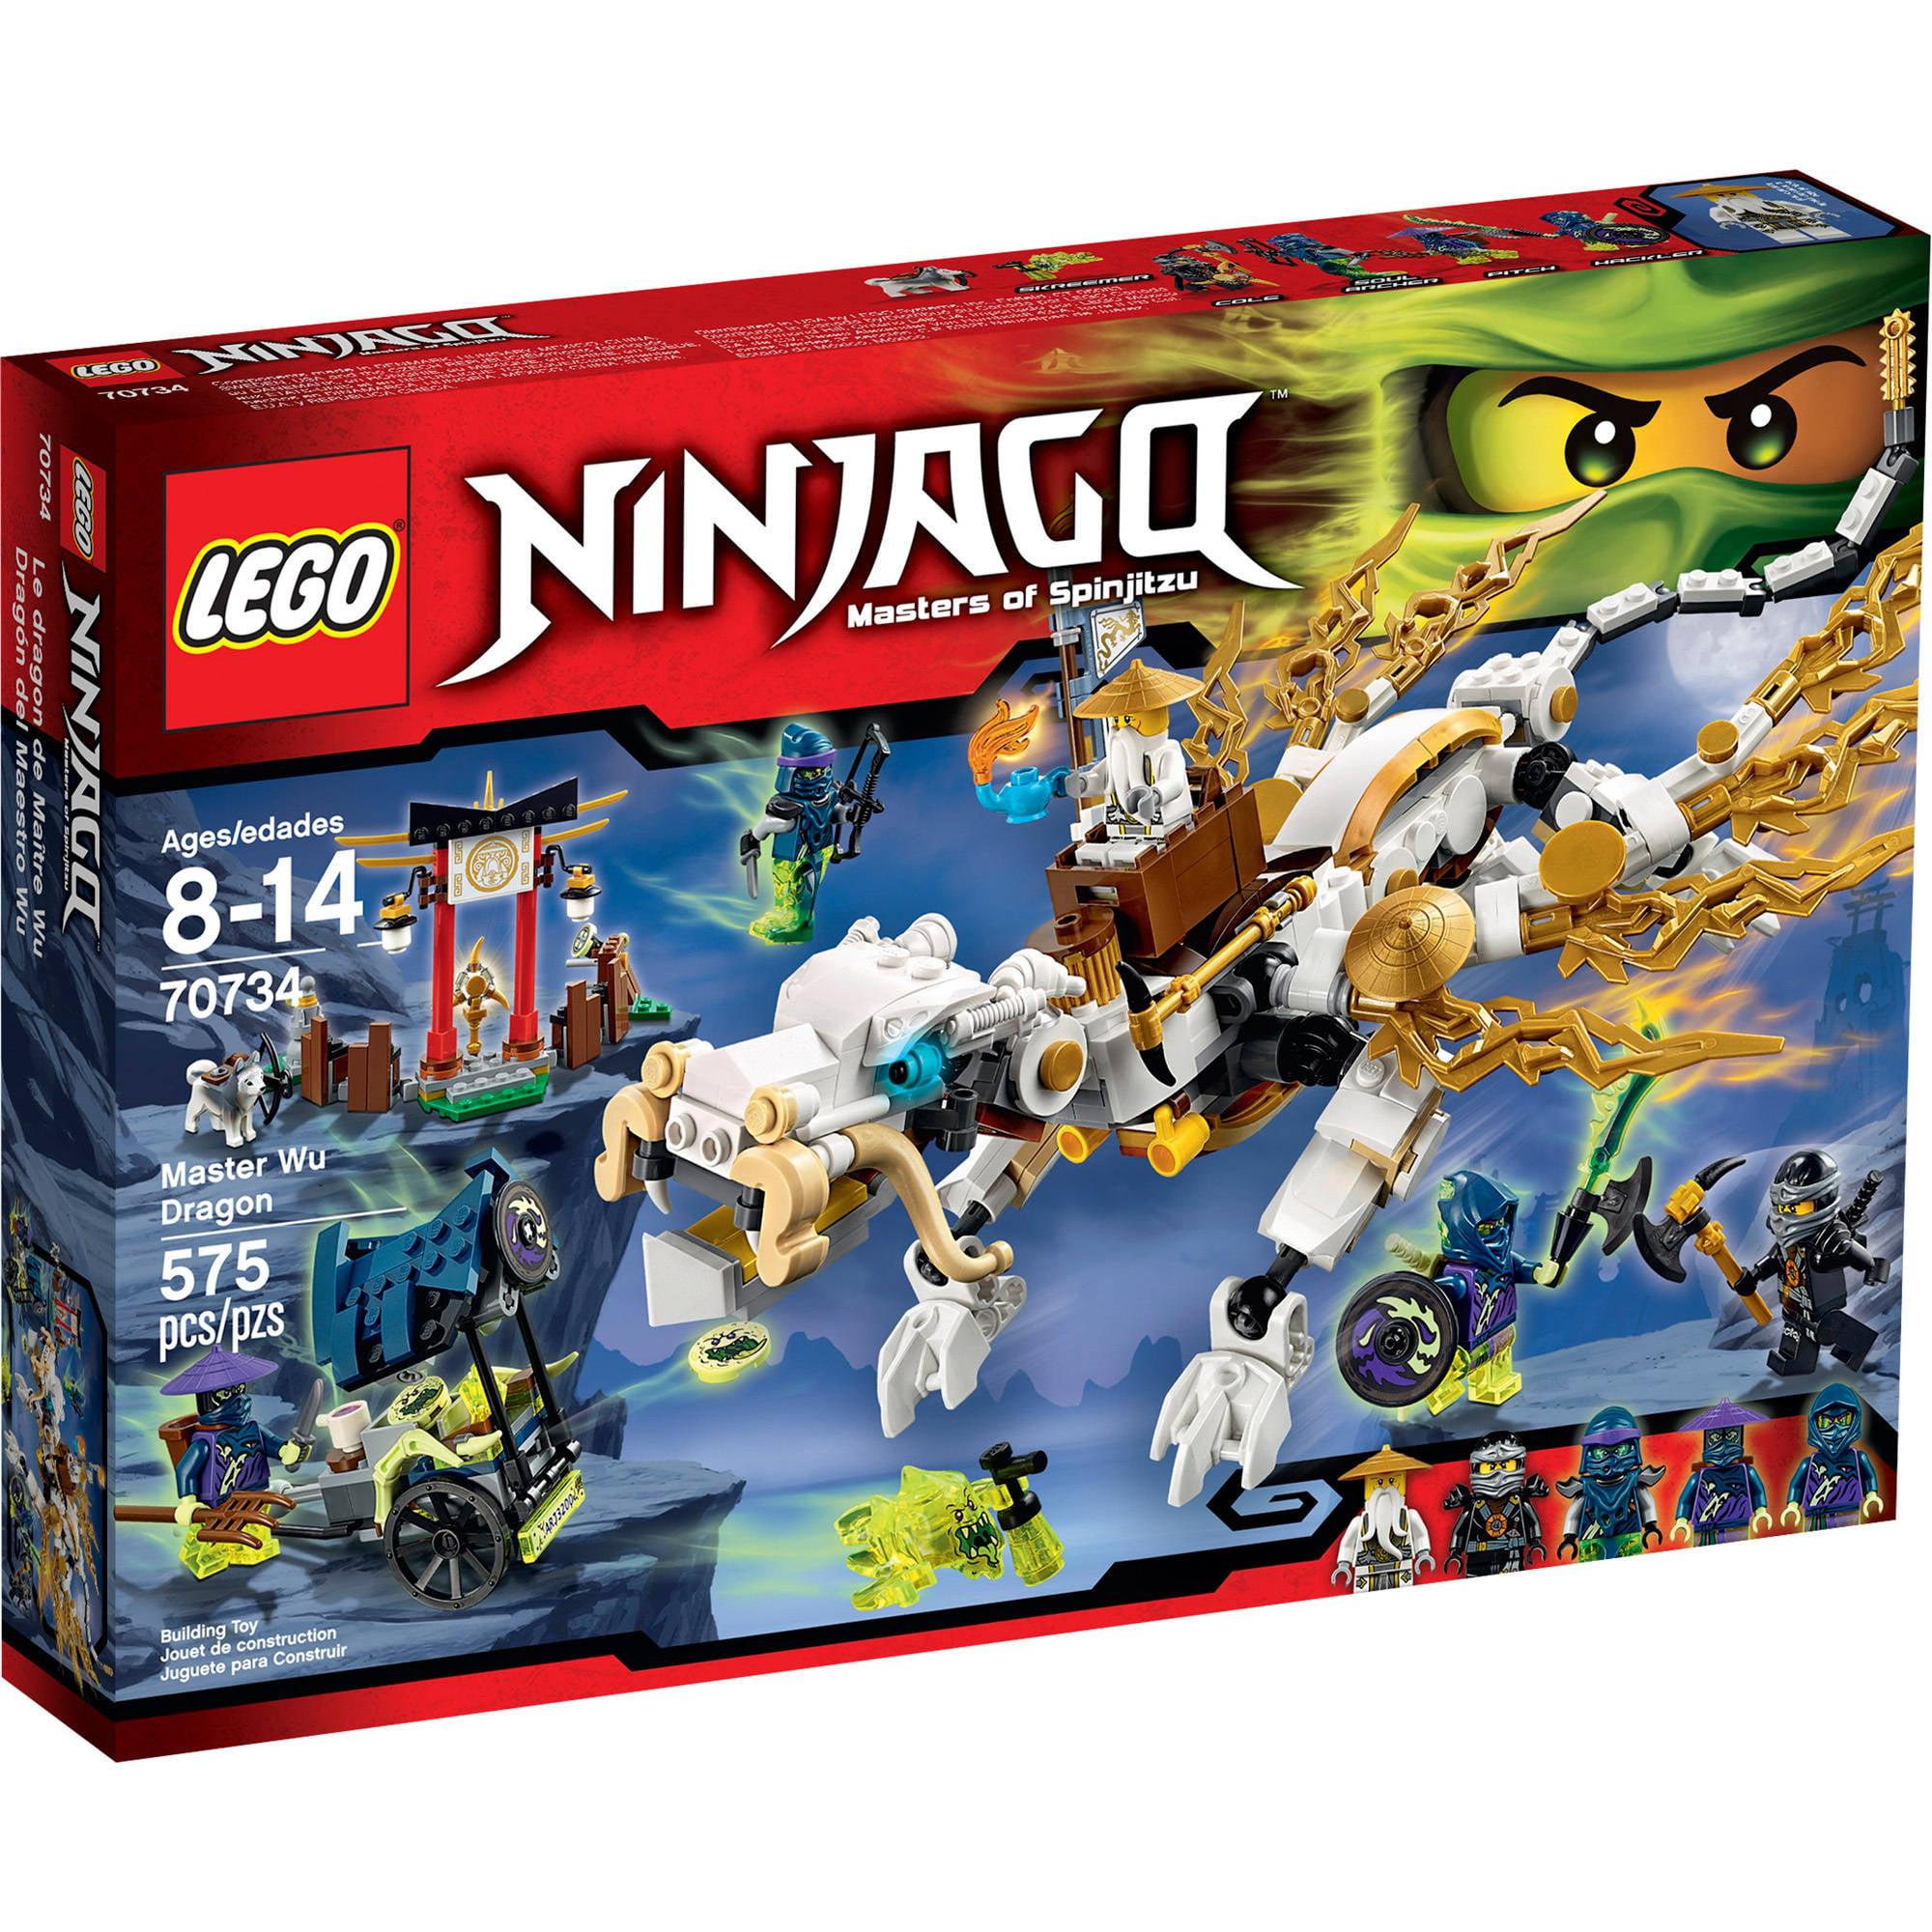 LEGO Ninjago Master Wu Dragon, 70734